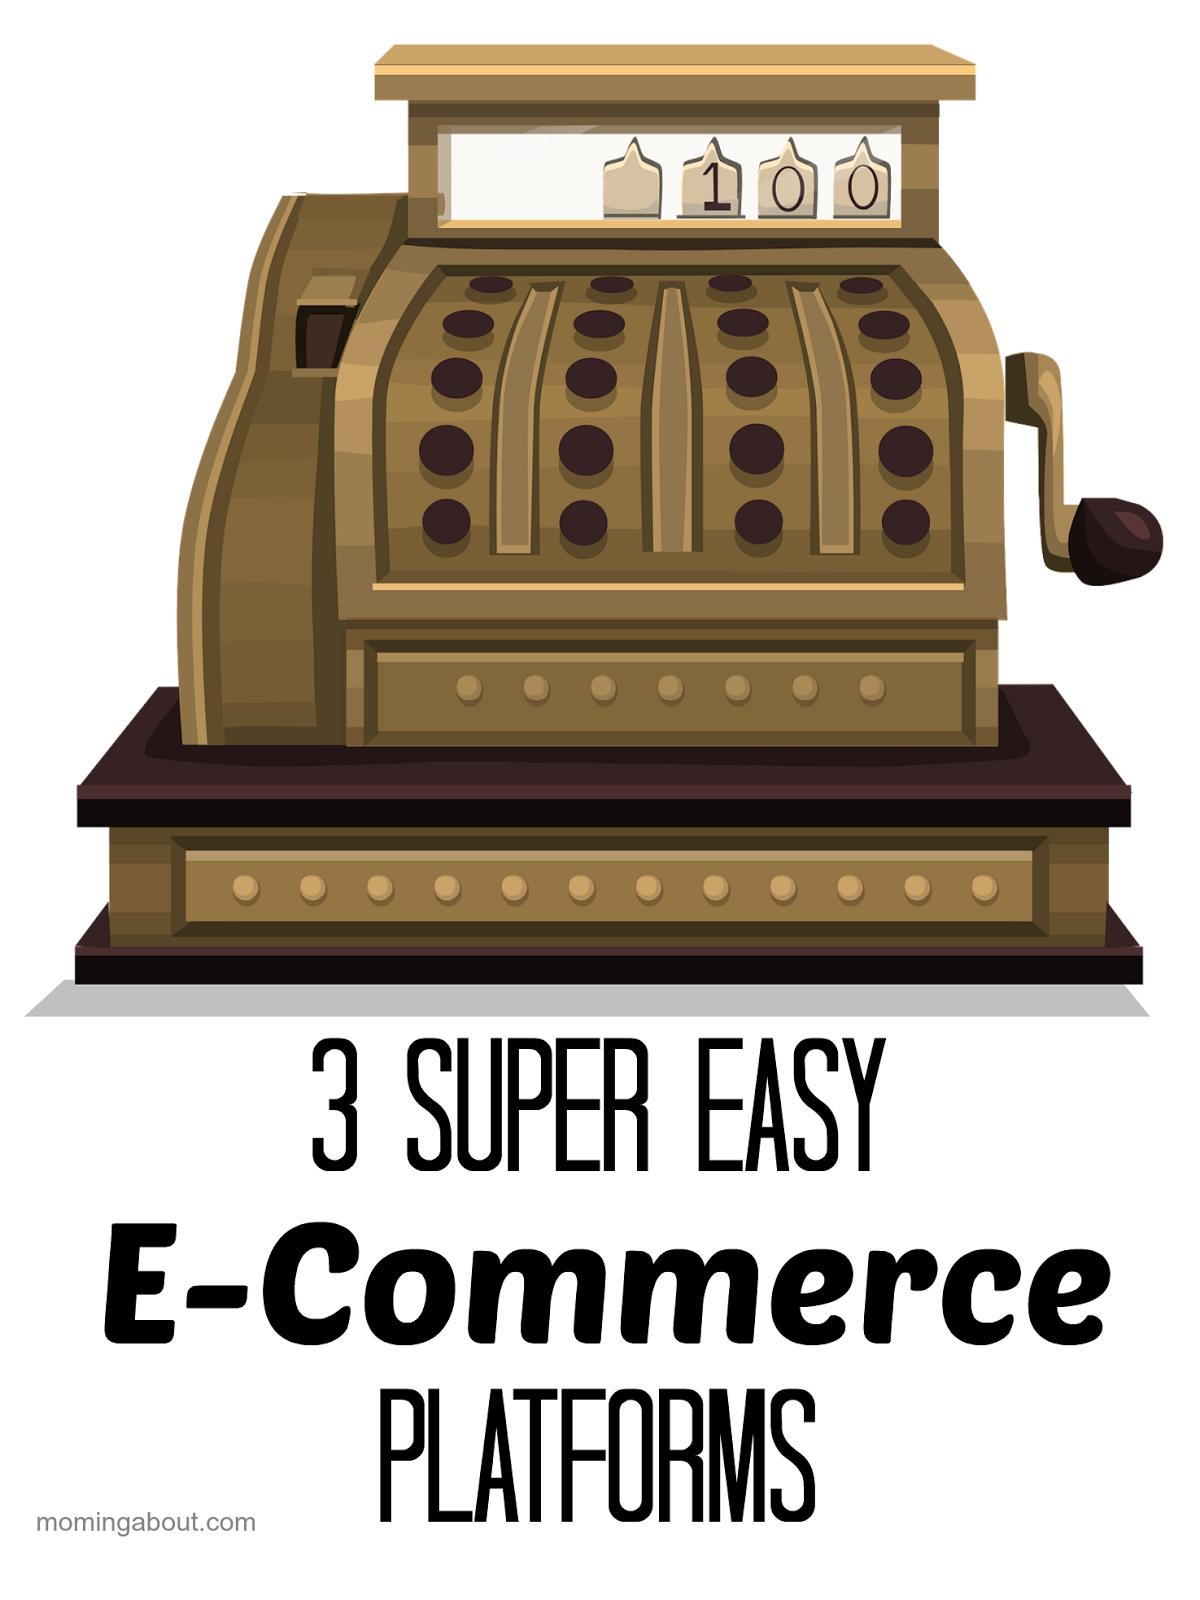 3 Super Easy E-Commerce Platforms